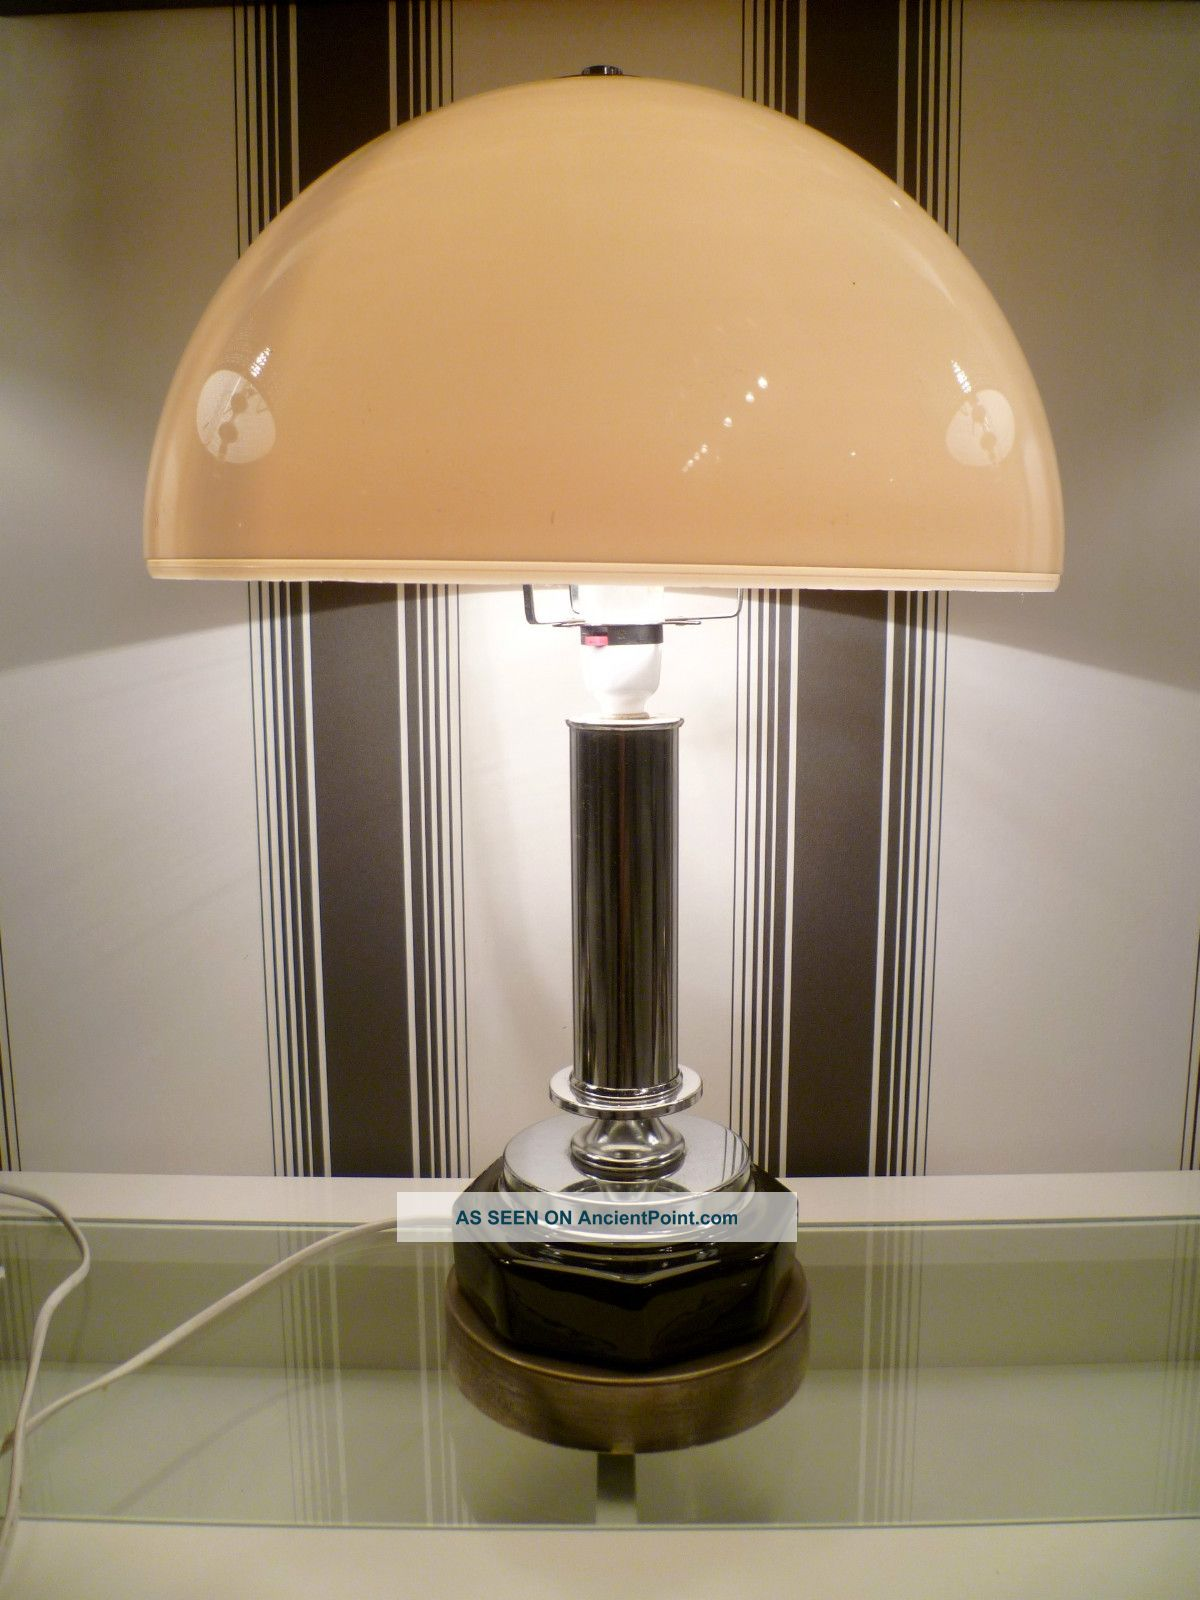 Large 1950s Art Deco Revival Table Lamp Chrome Black & White Retro Bauhaus Style 20th Century photo